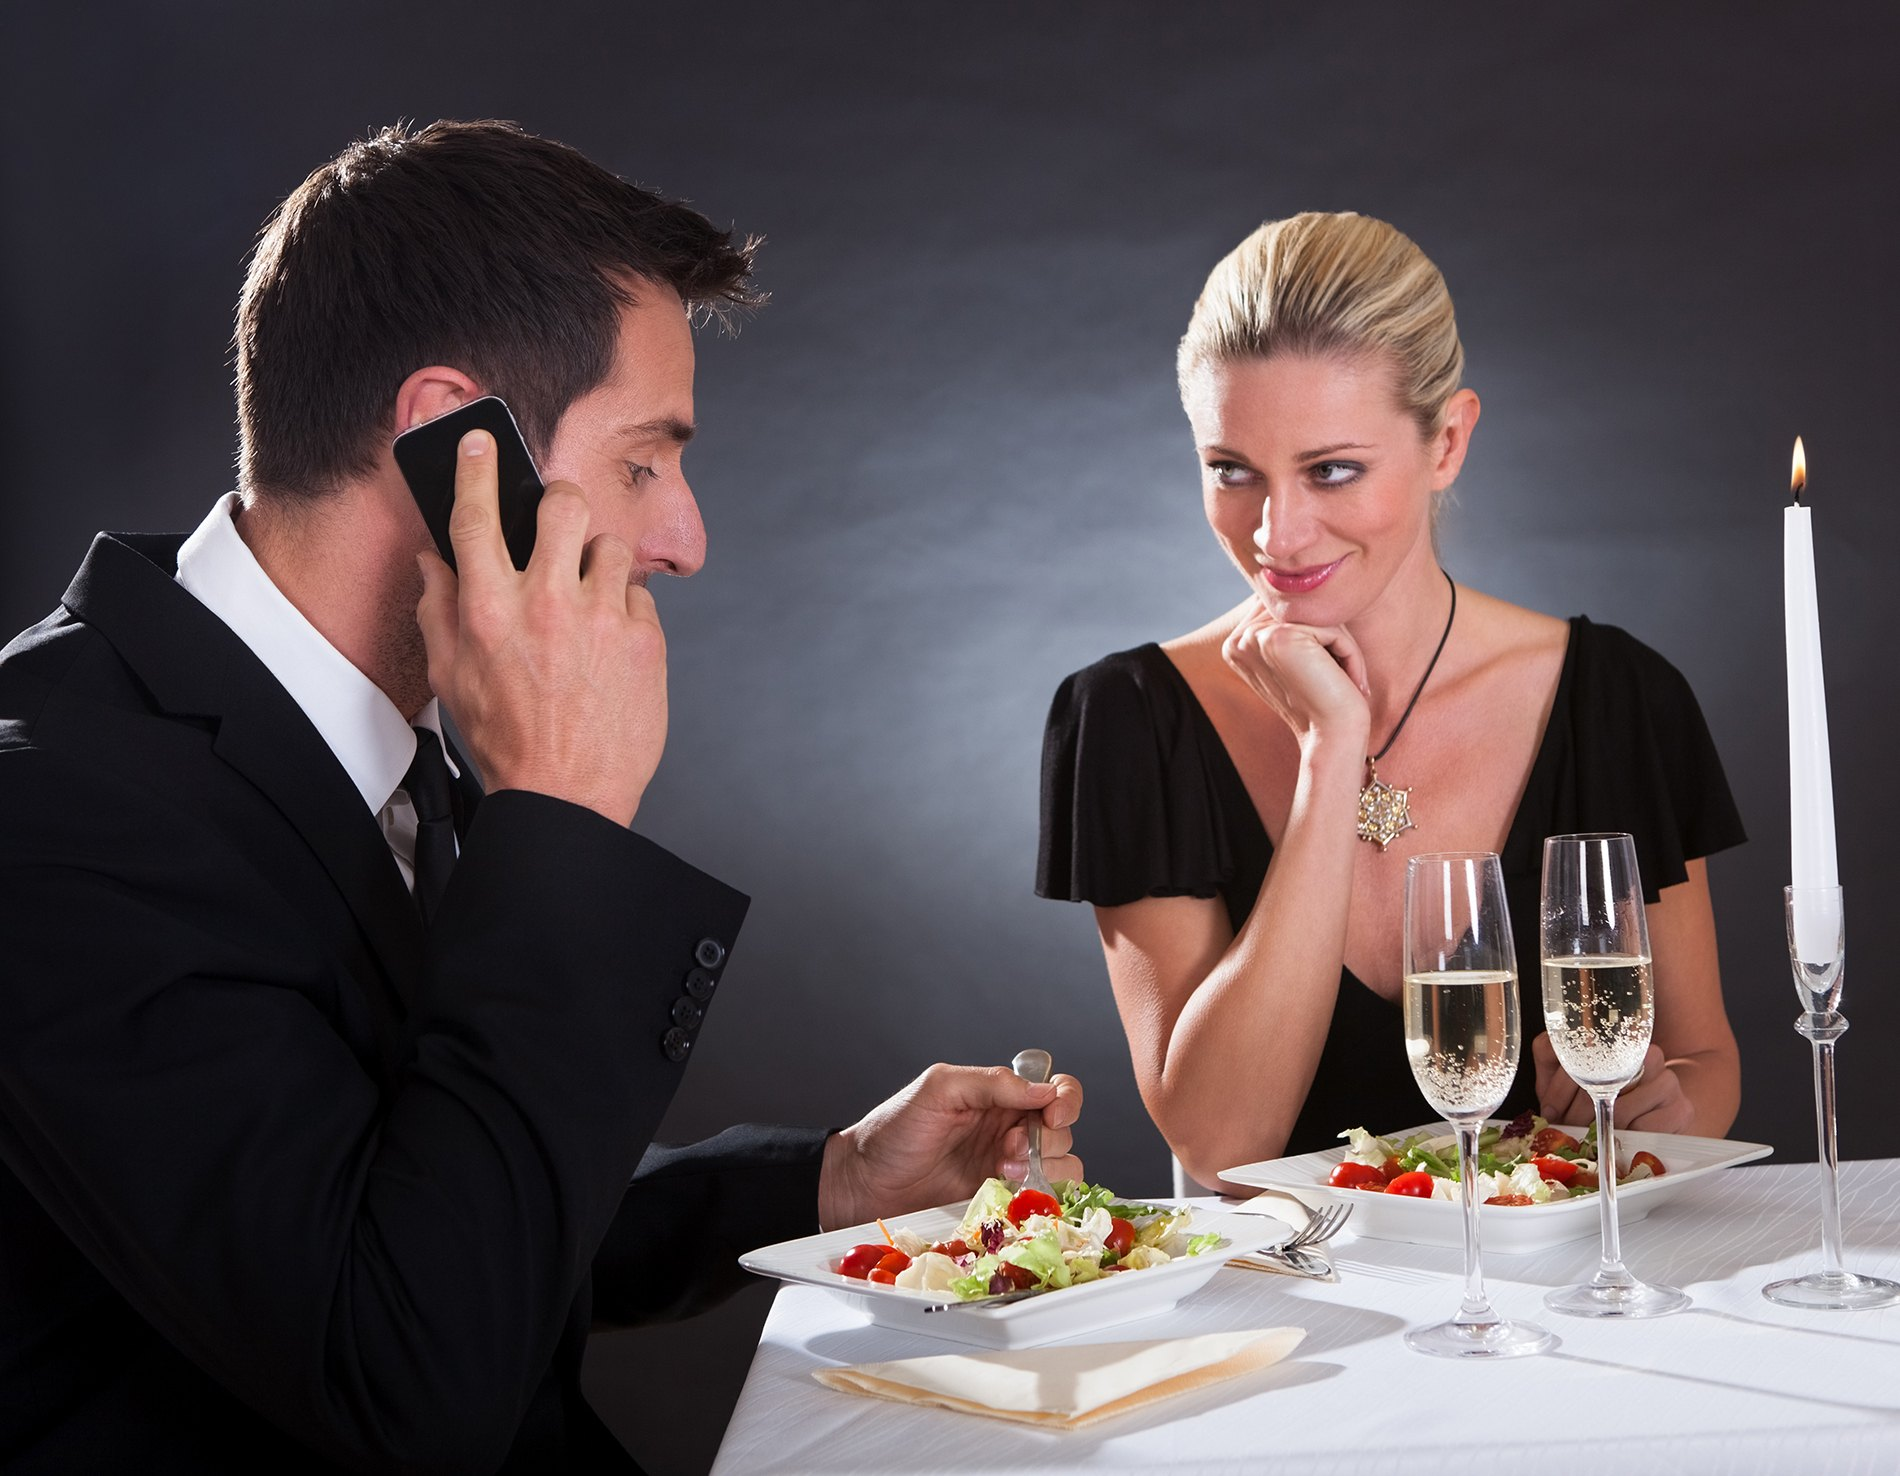 Galateo Tovagliolo A Destra galateo a tavola: 34 regole essenziali [guida] | agrodolce